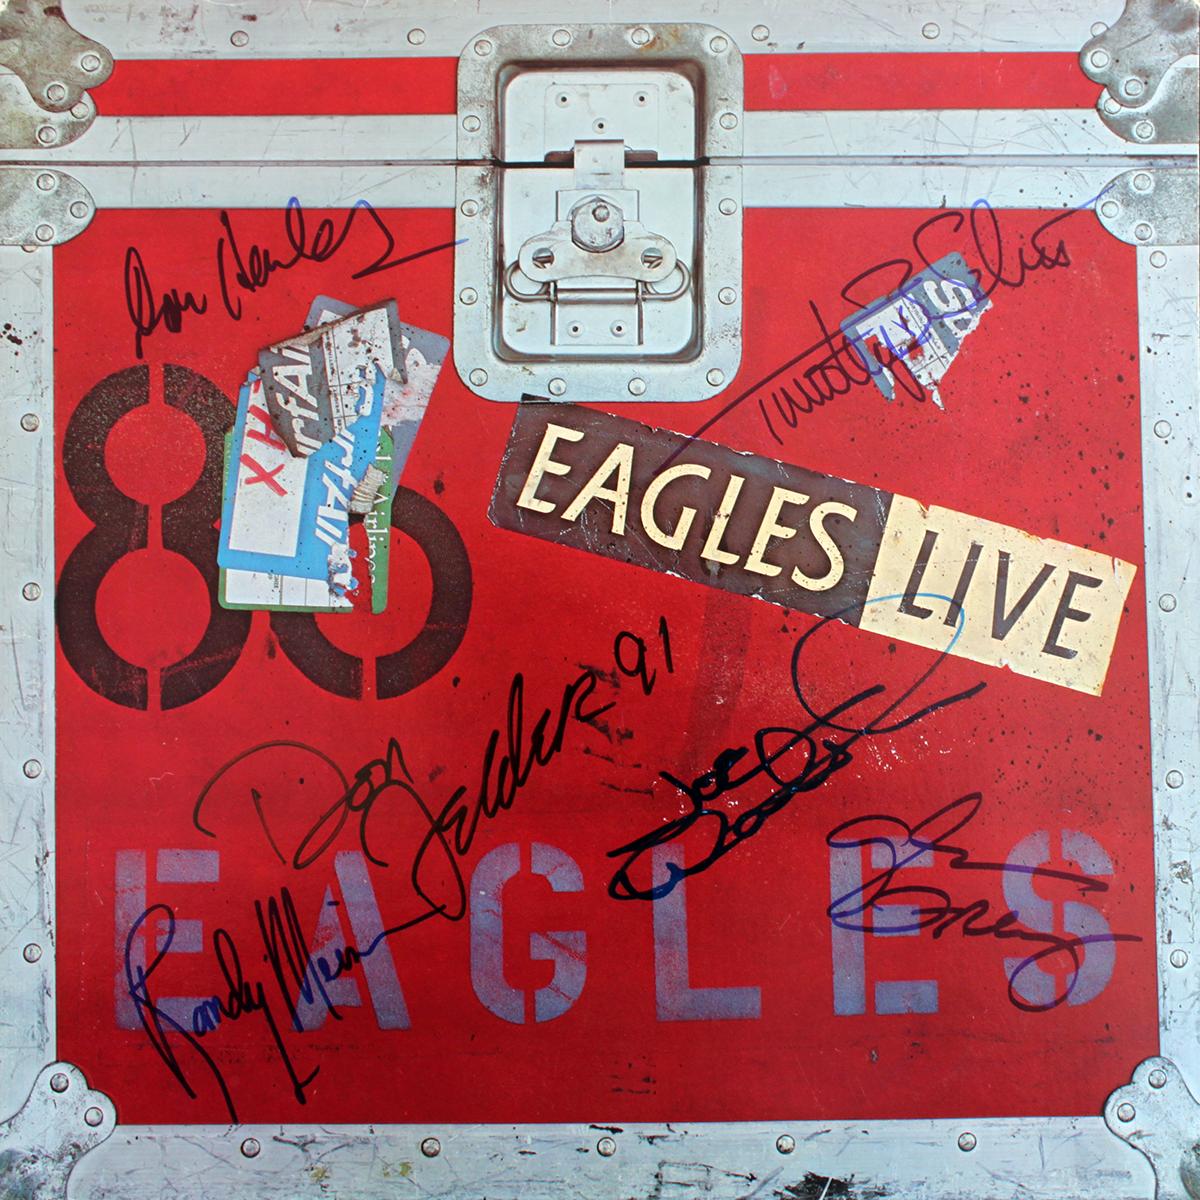 Eagles LP - Eagles Live #2